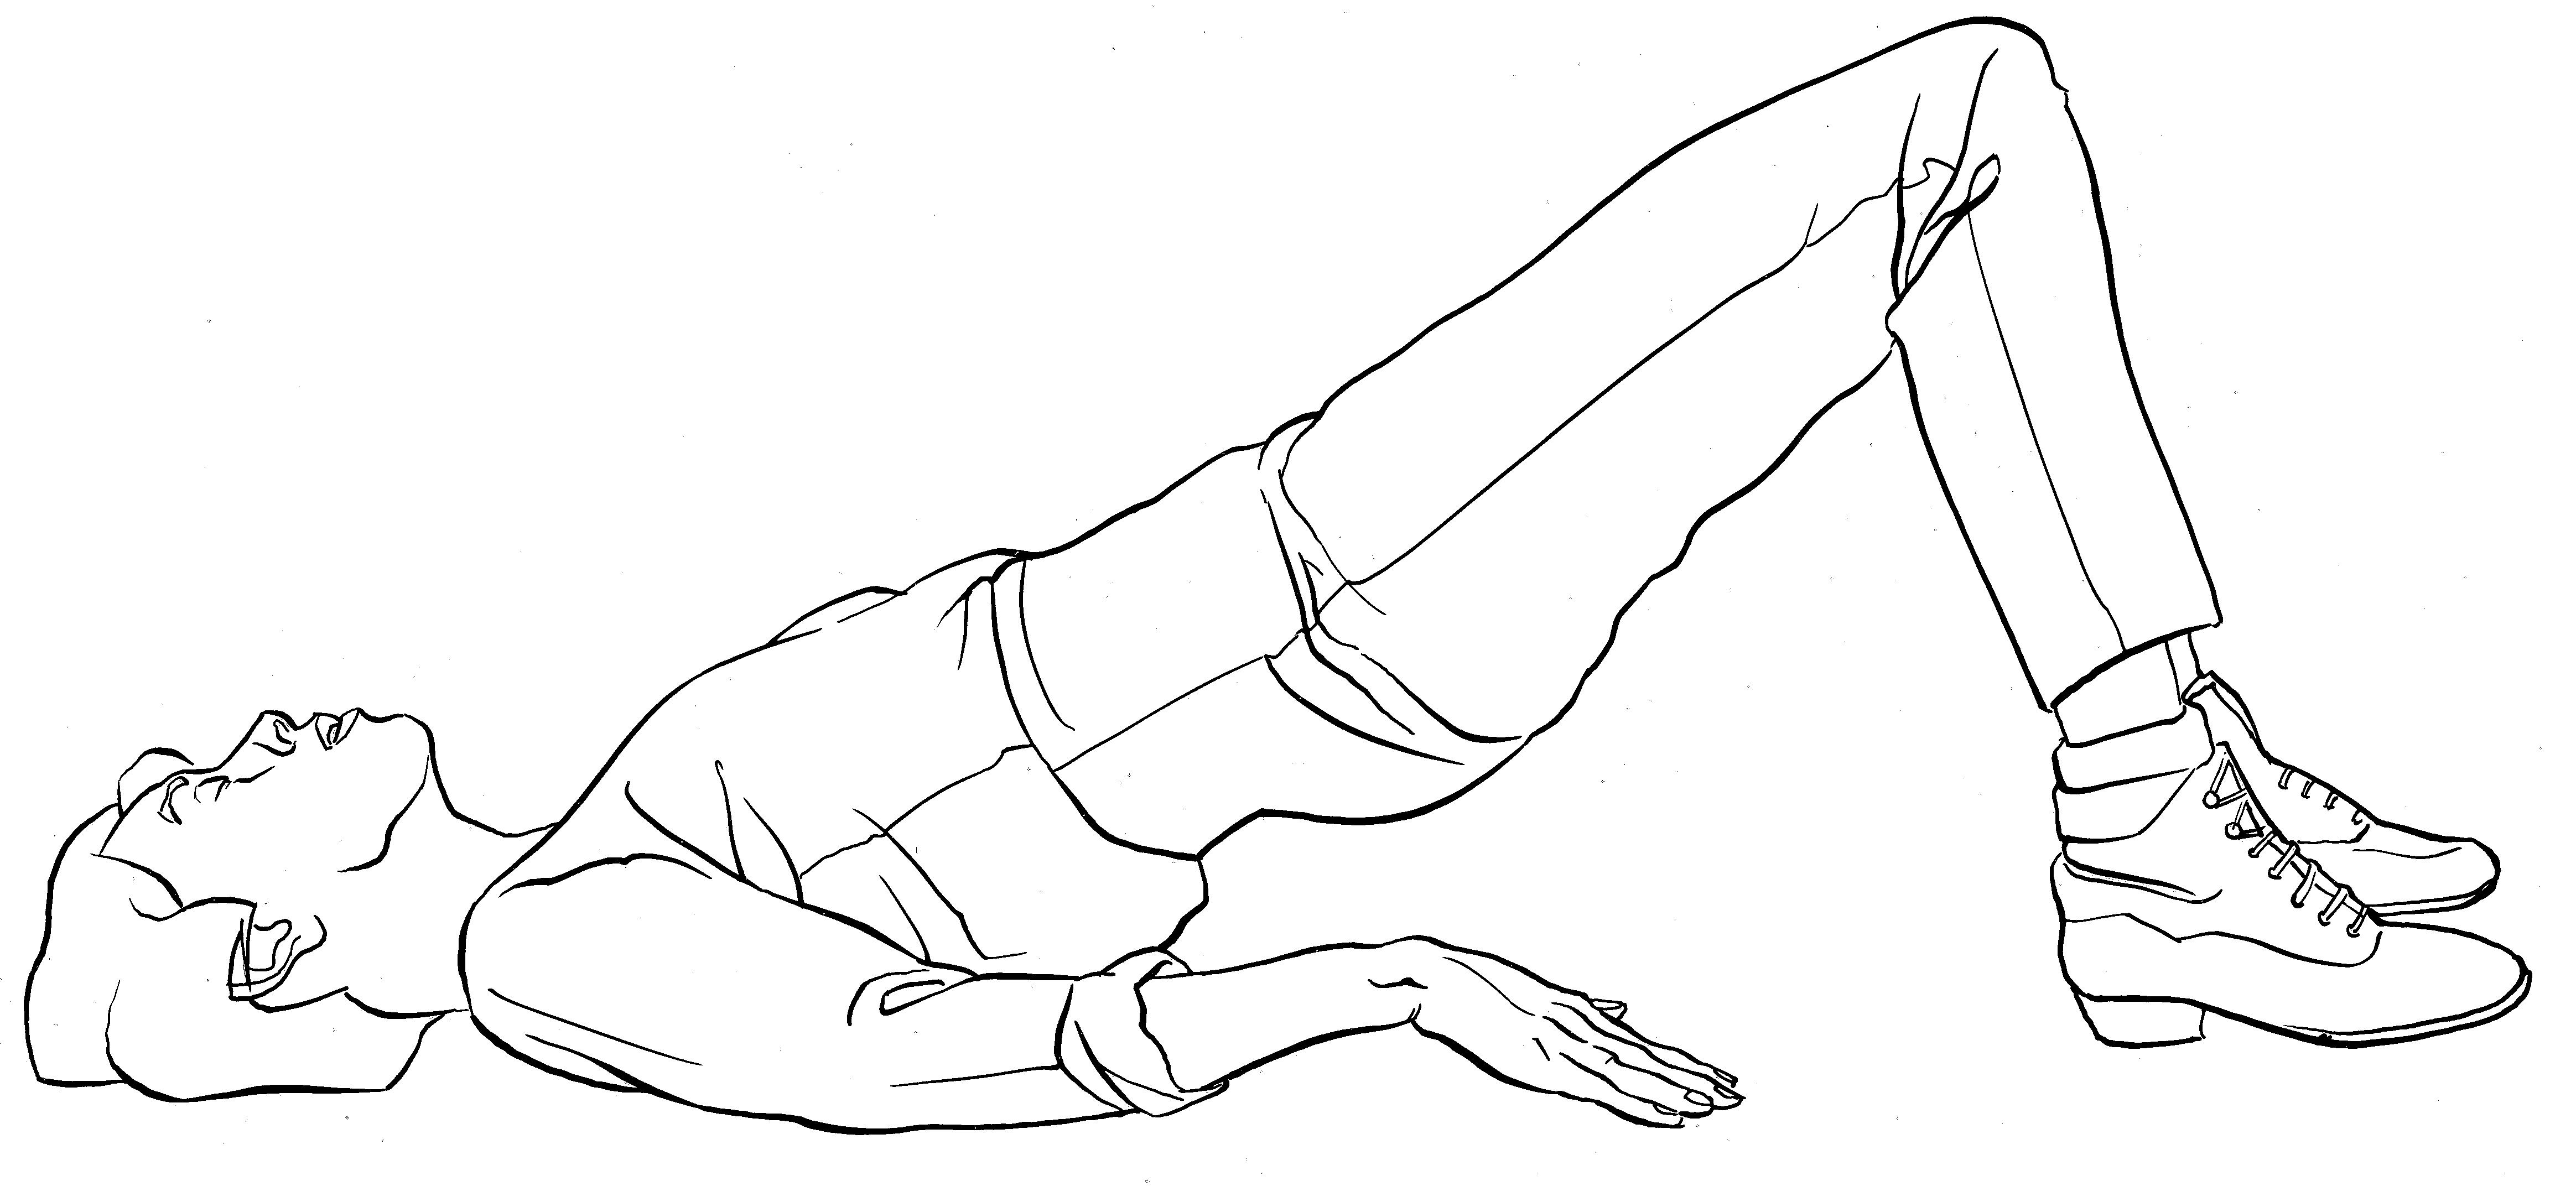 bridge for pelvic girdle pain